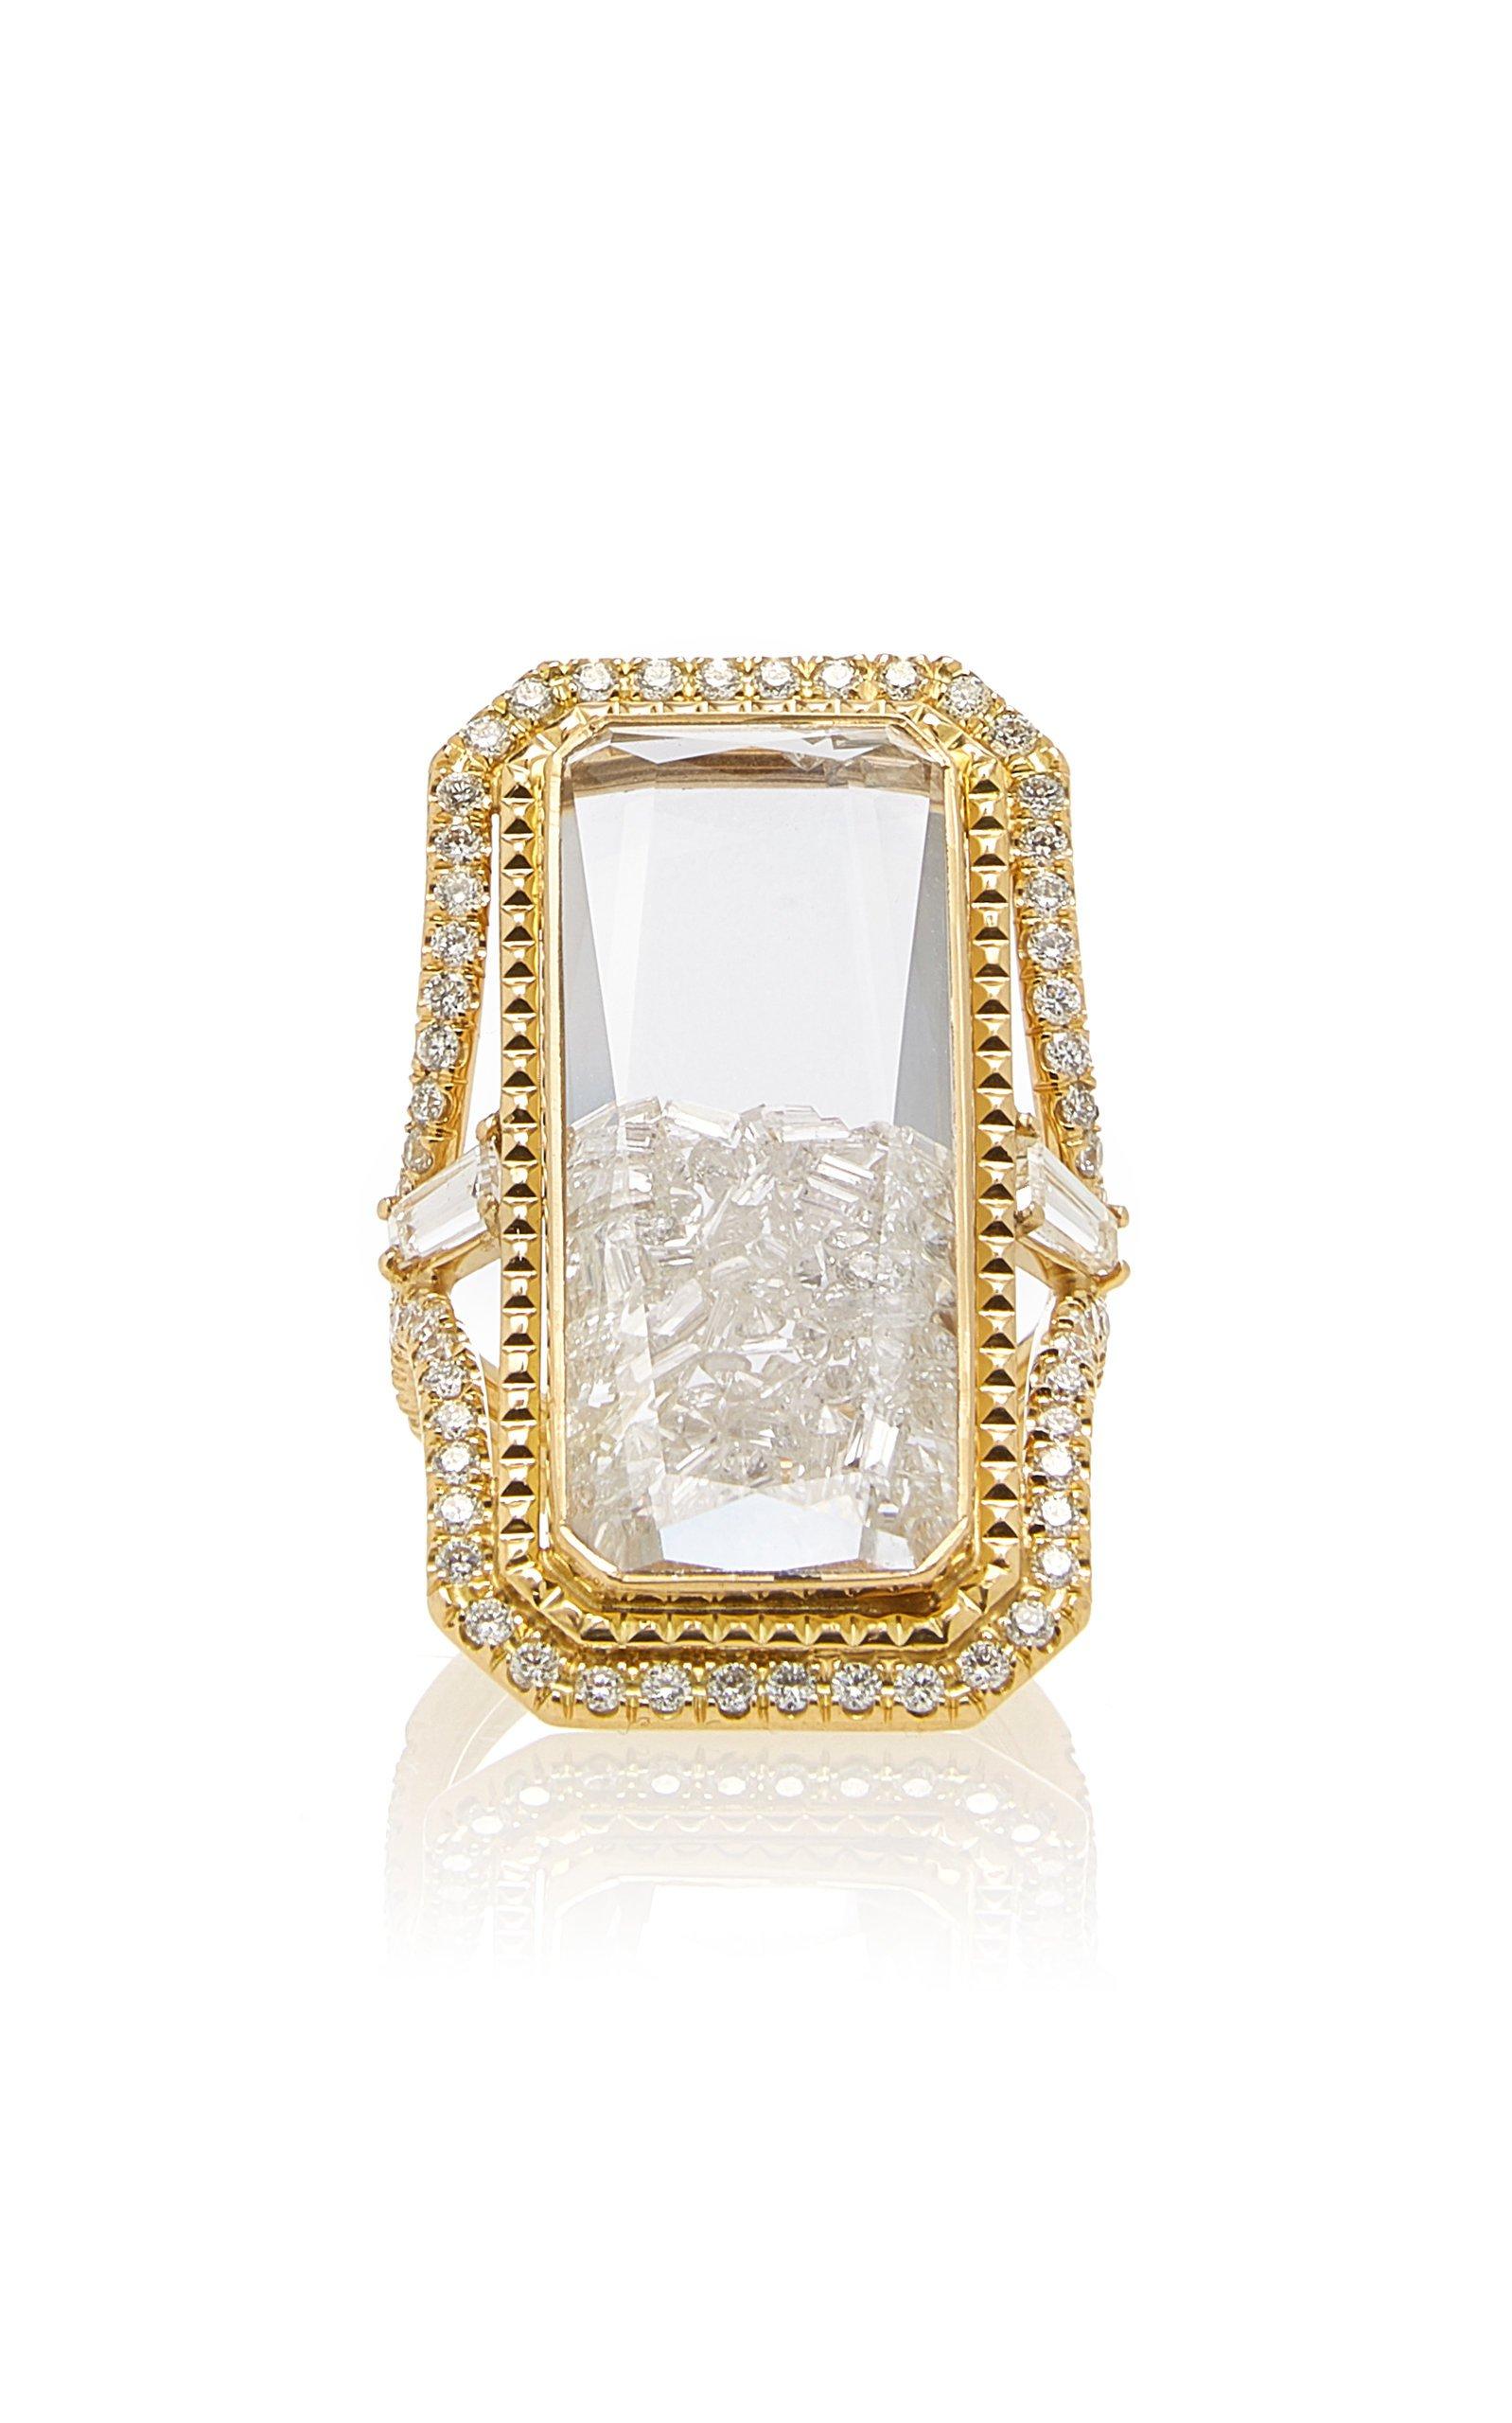 Moritz Glik Rectangular Diamond Kaleidoscope Shaker Ring